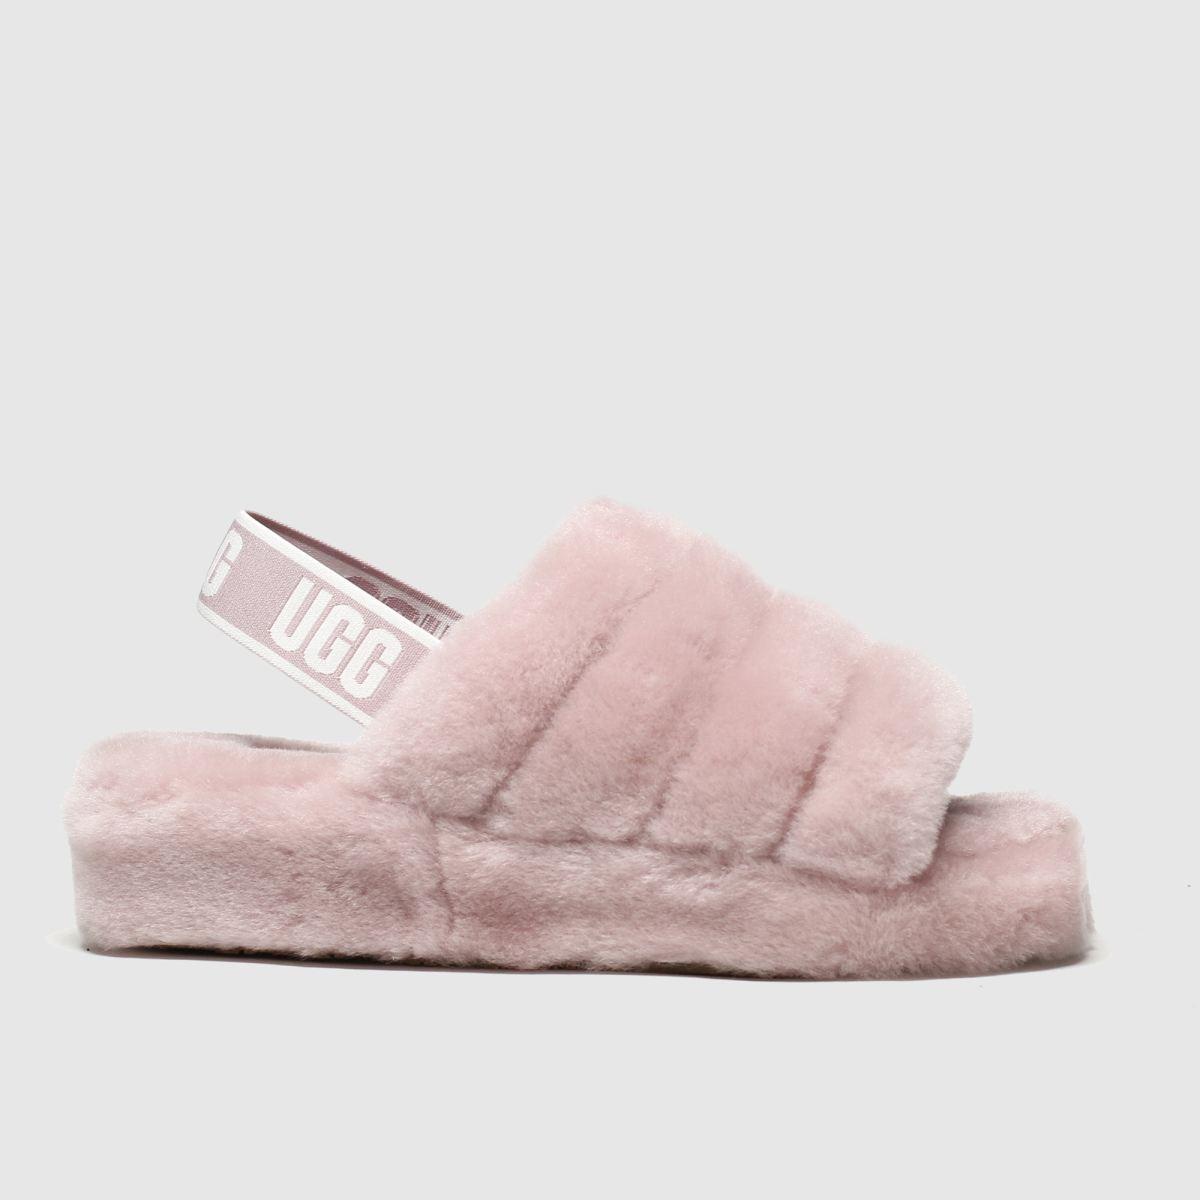 Ugg Pale Pink Fluff Yeah Slide Slippers